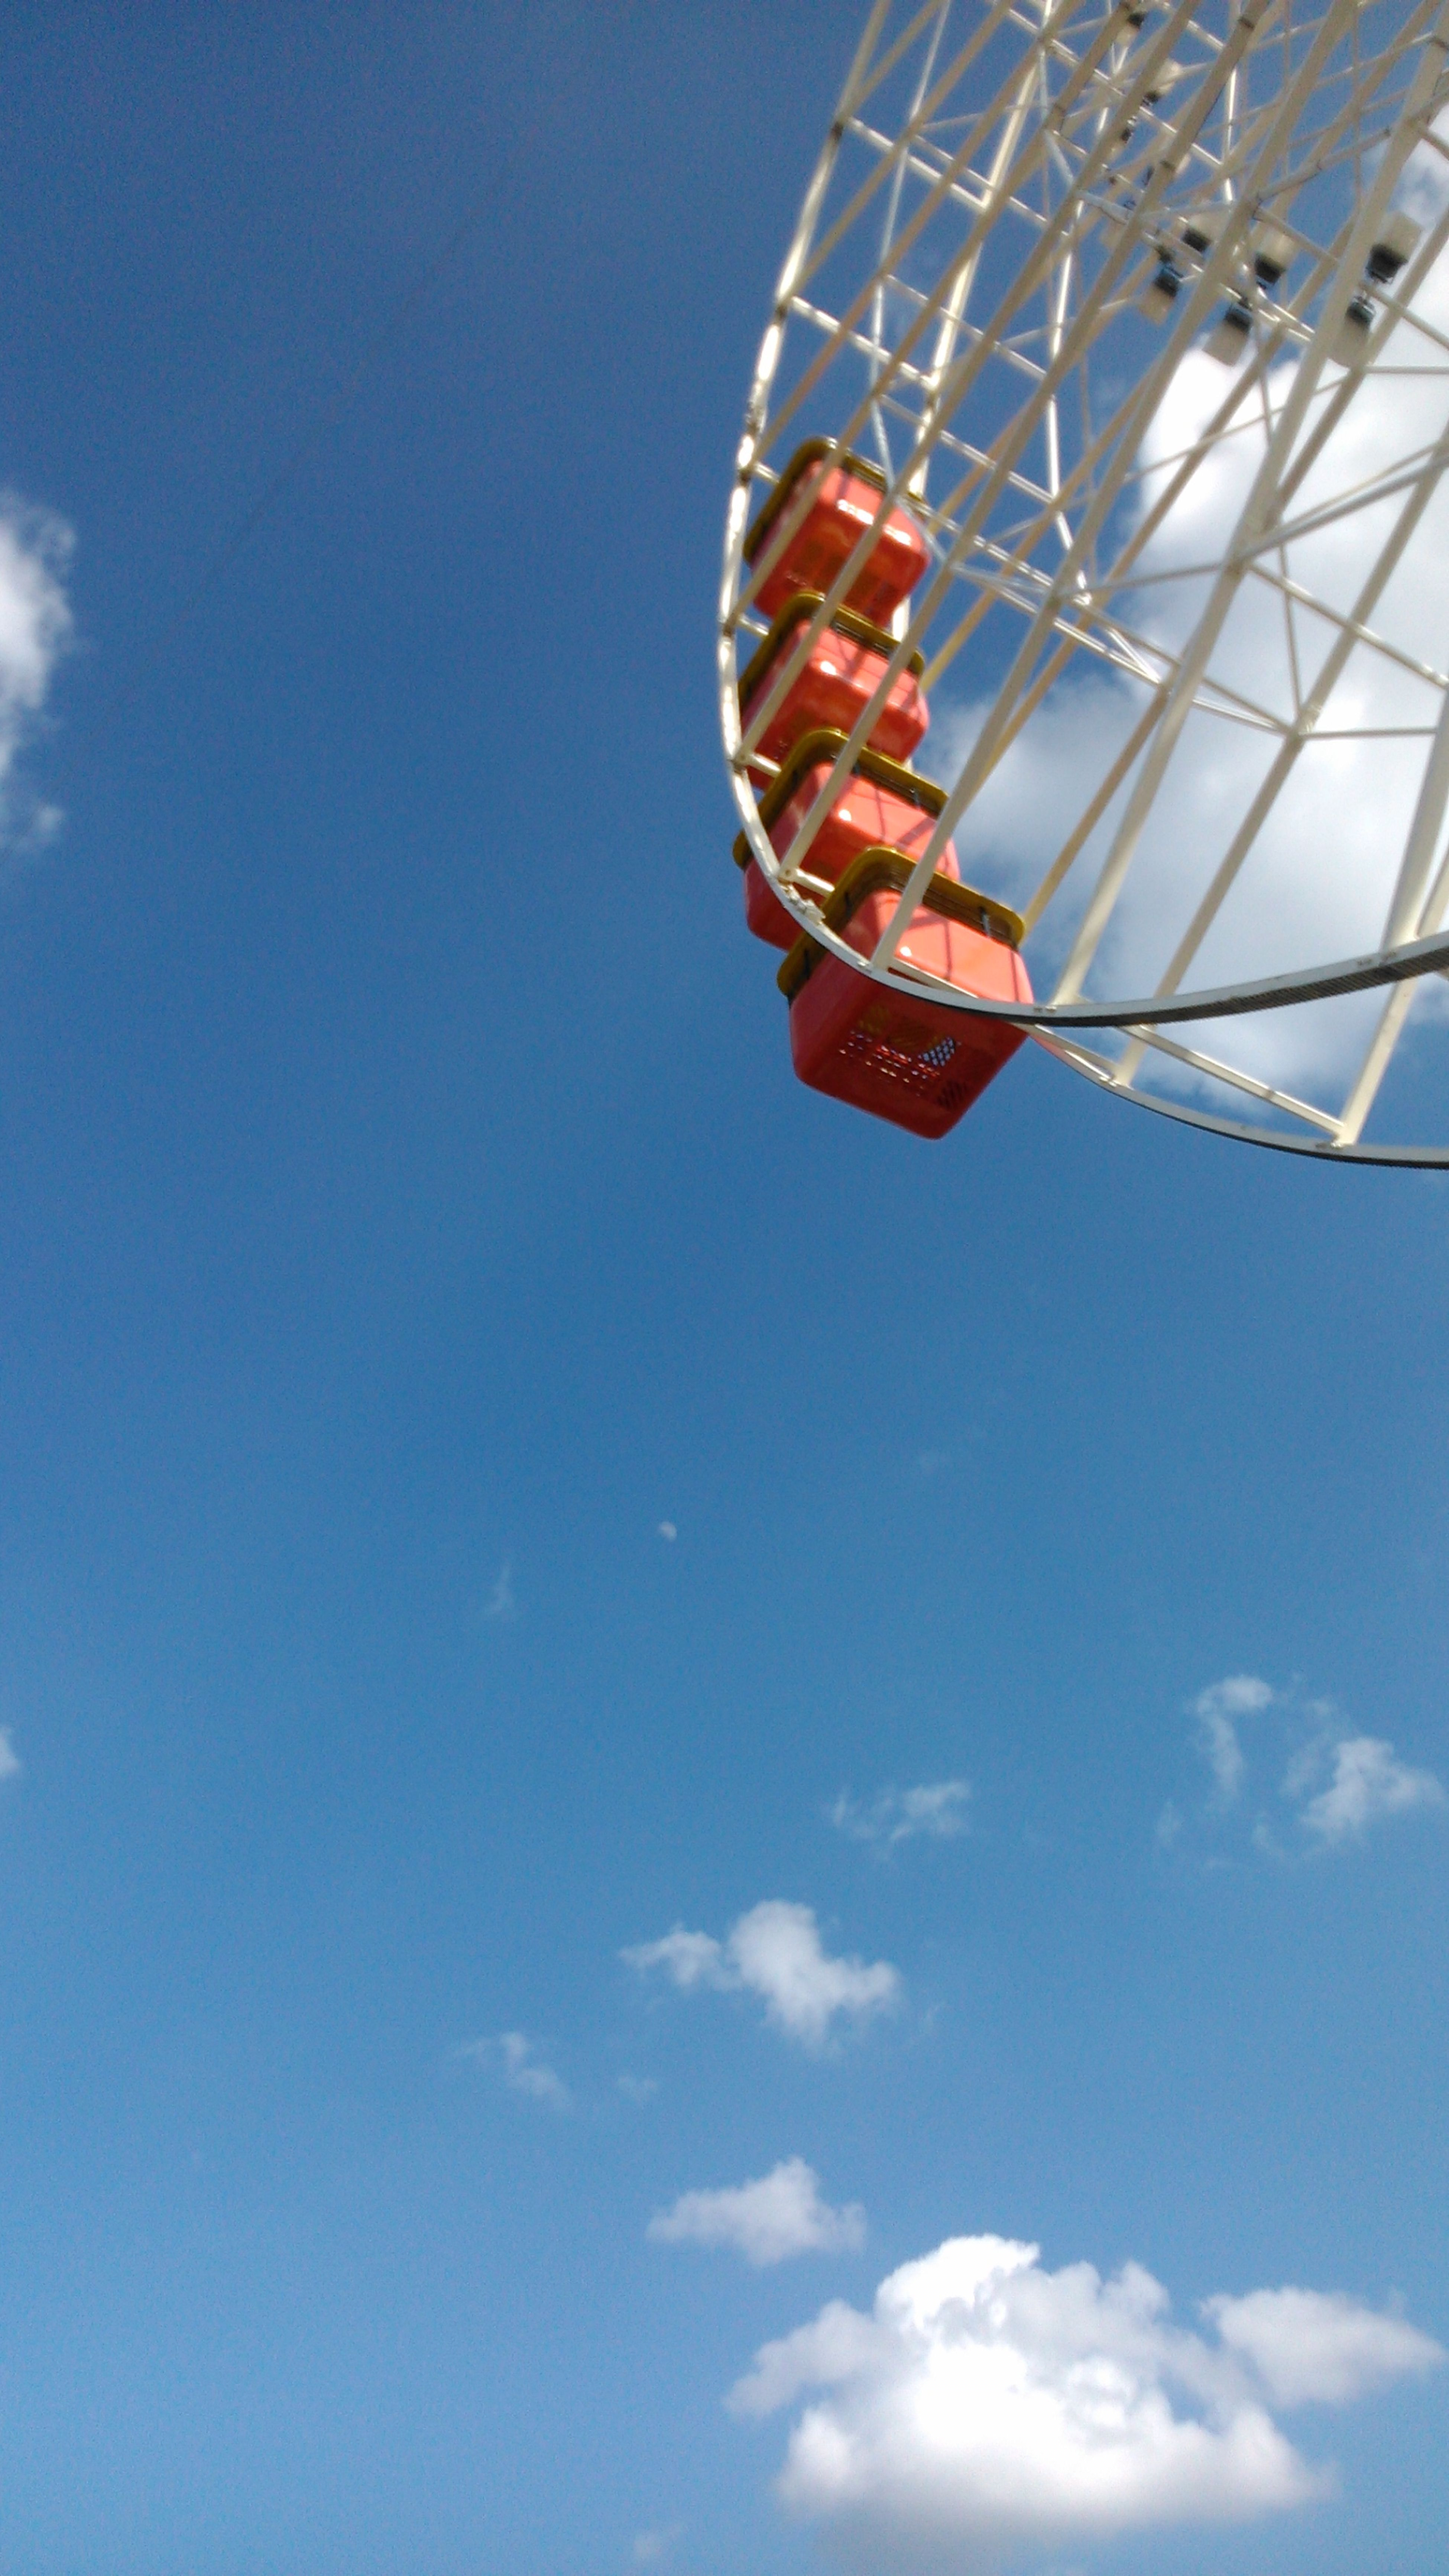 Sky And Circle First Eyeem Photo